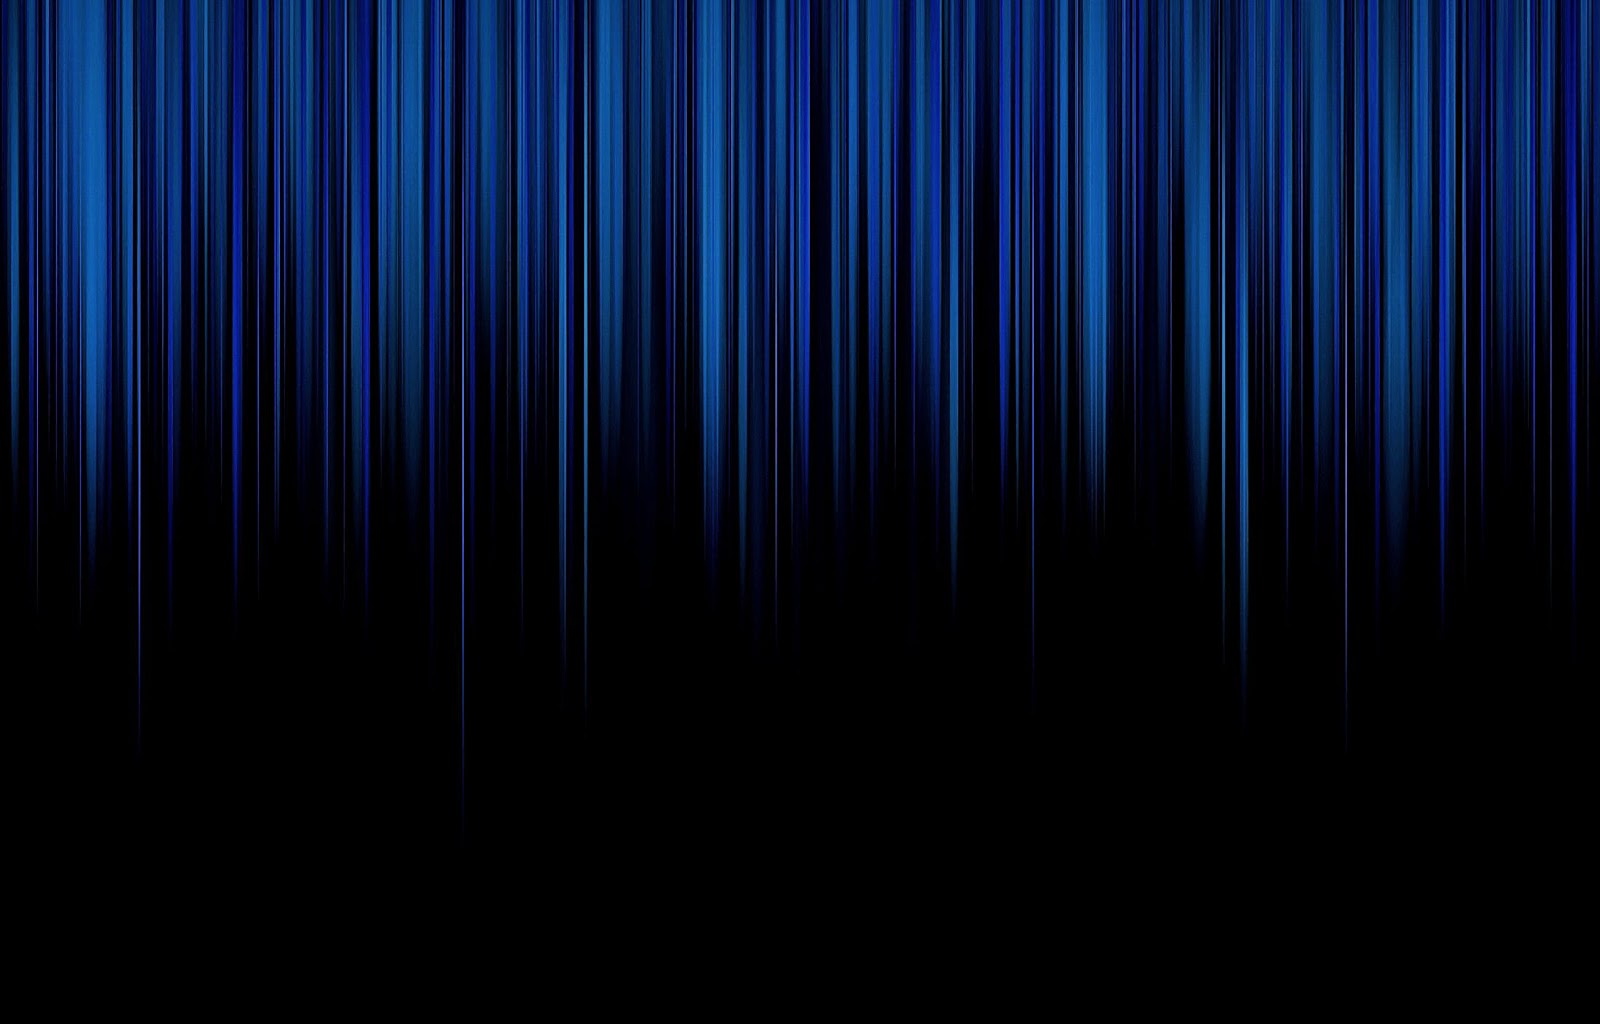 Black And Blue Stripes Ipad Wallpaper